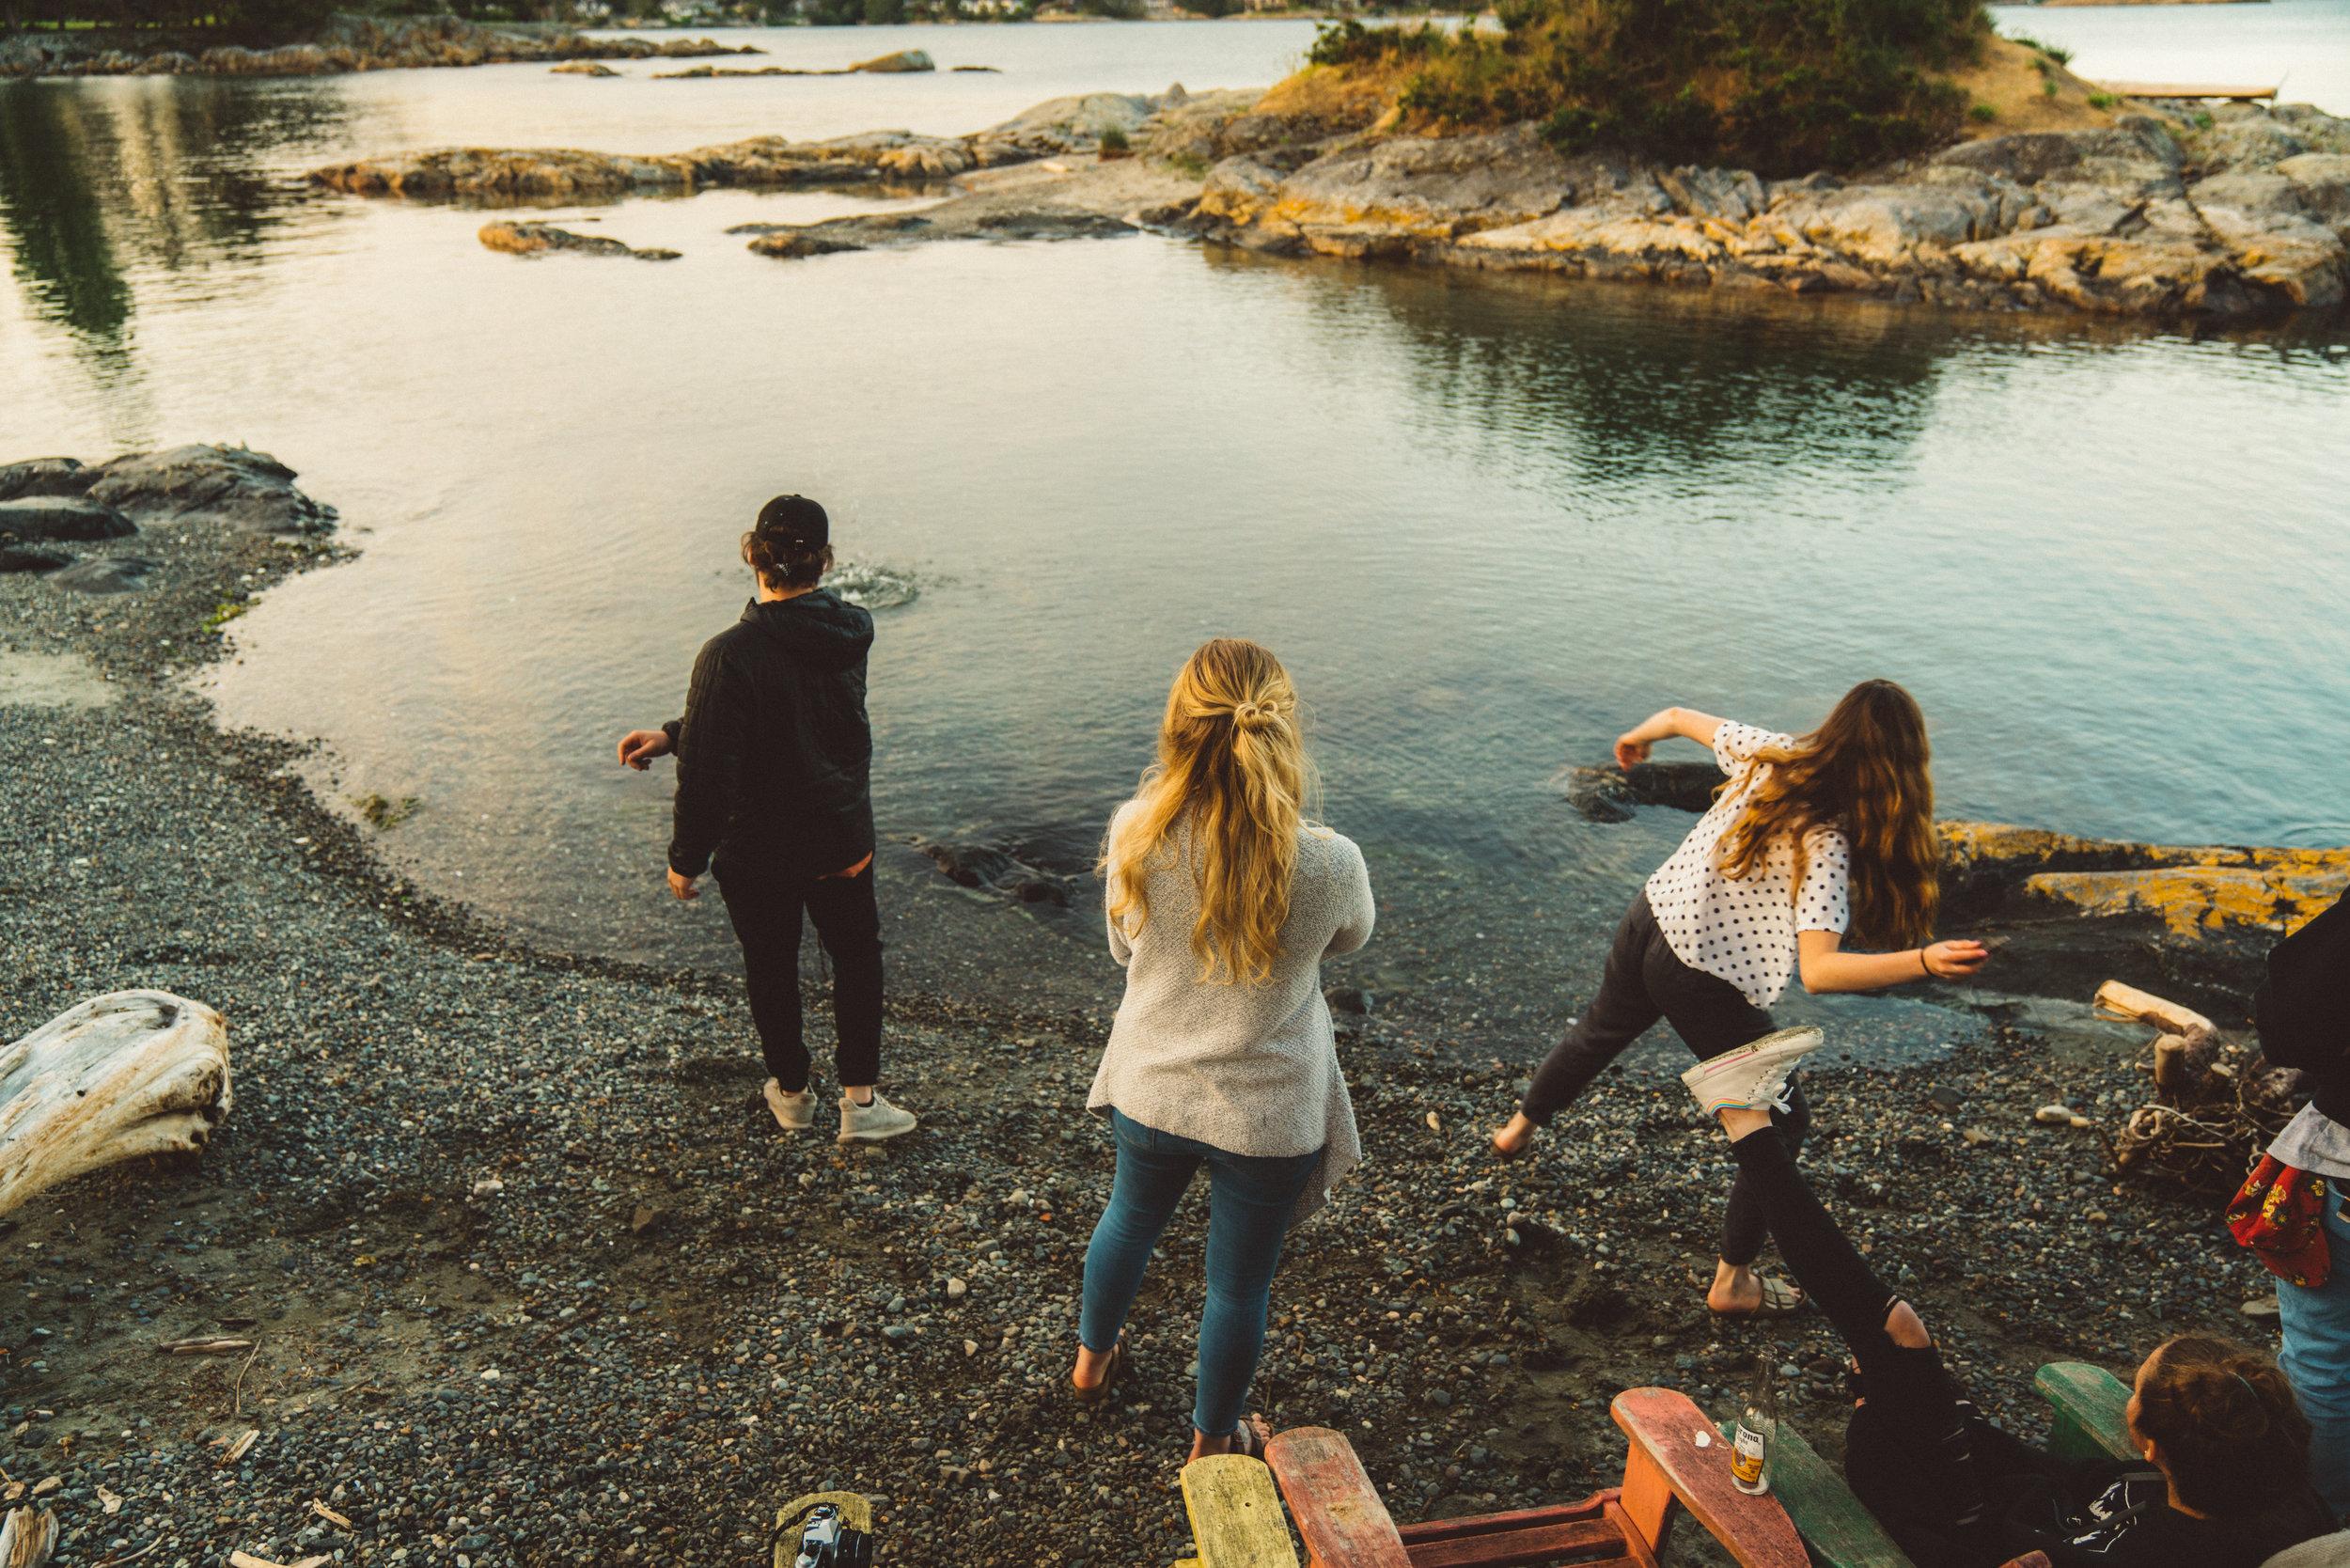 Jack and Annika skipping stones while Tay, Marijke, and Niko look on.